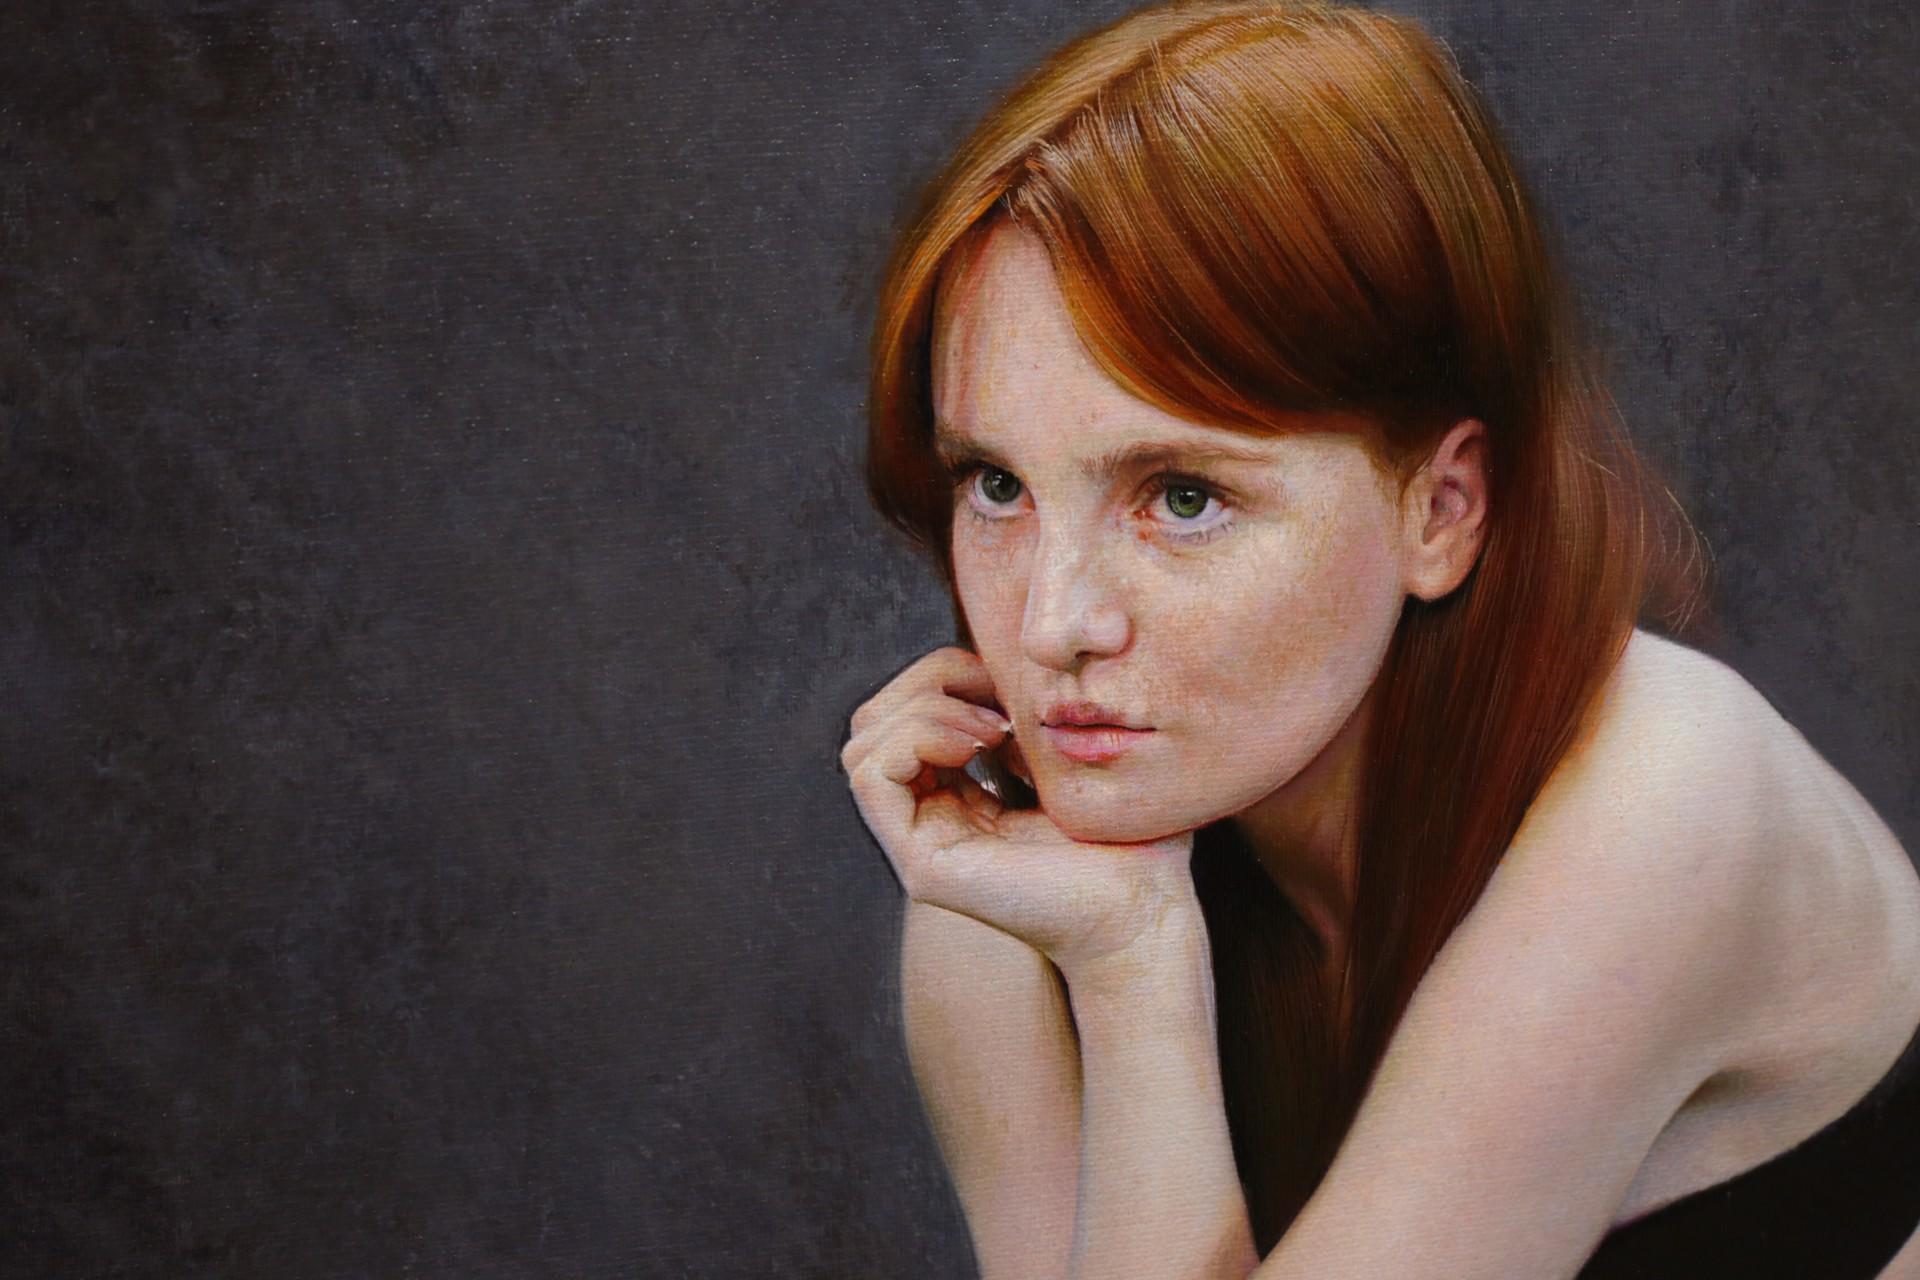 The Thinker by Anna Wypych